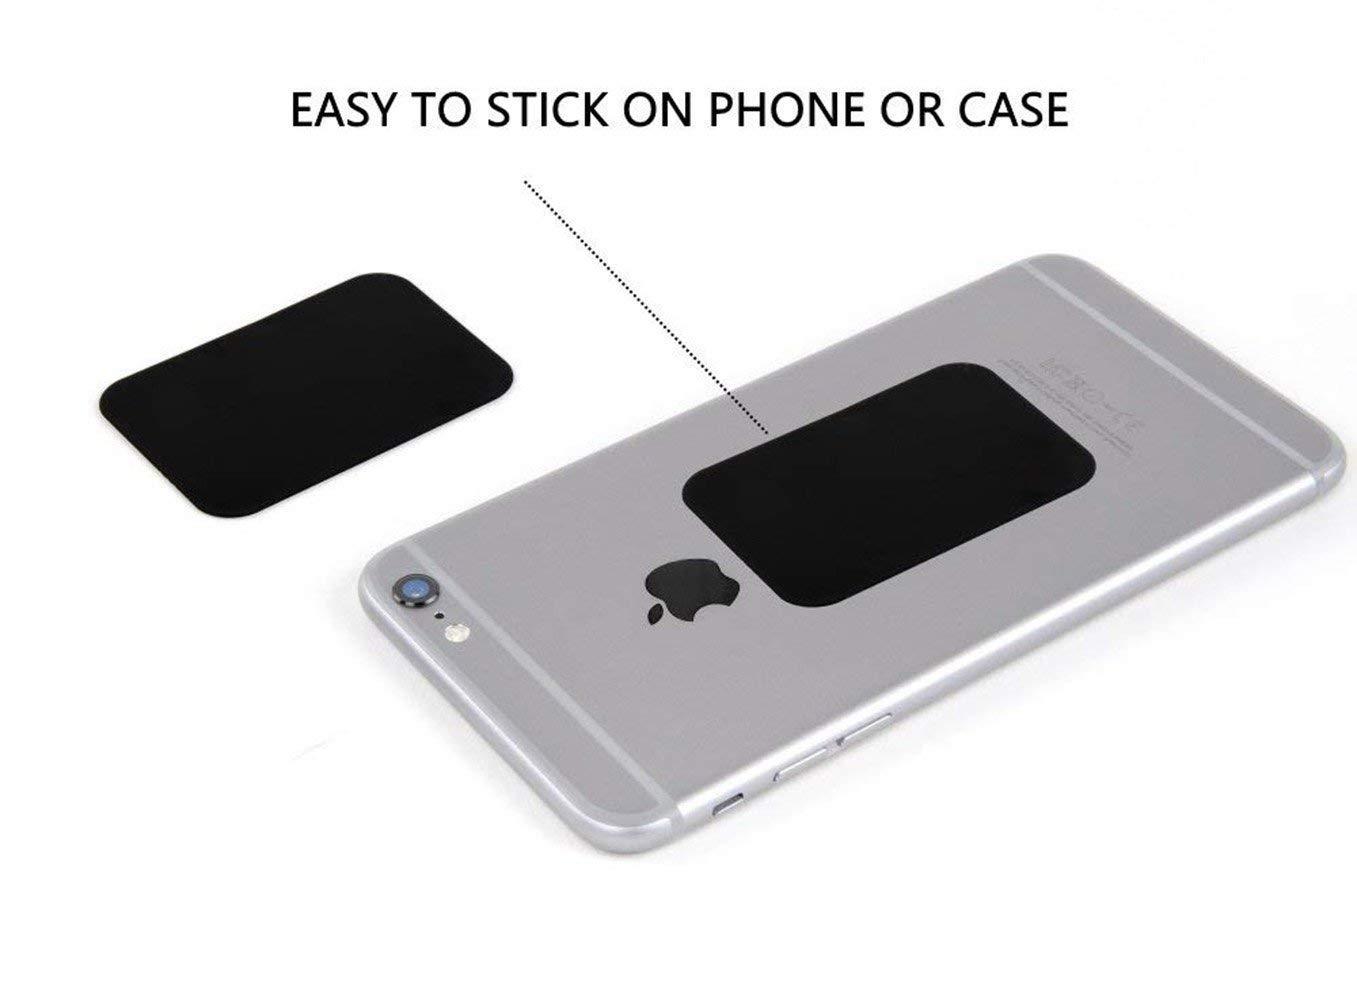 Metal Plate for Magnetic Mount 8 Pack Mount Metal Plate Best Tek Phone Magnet Sticker